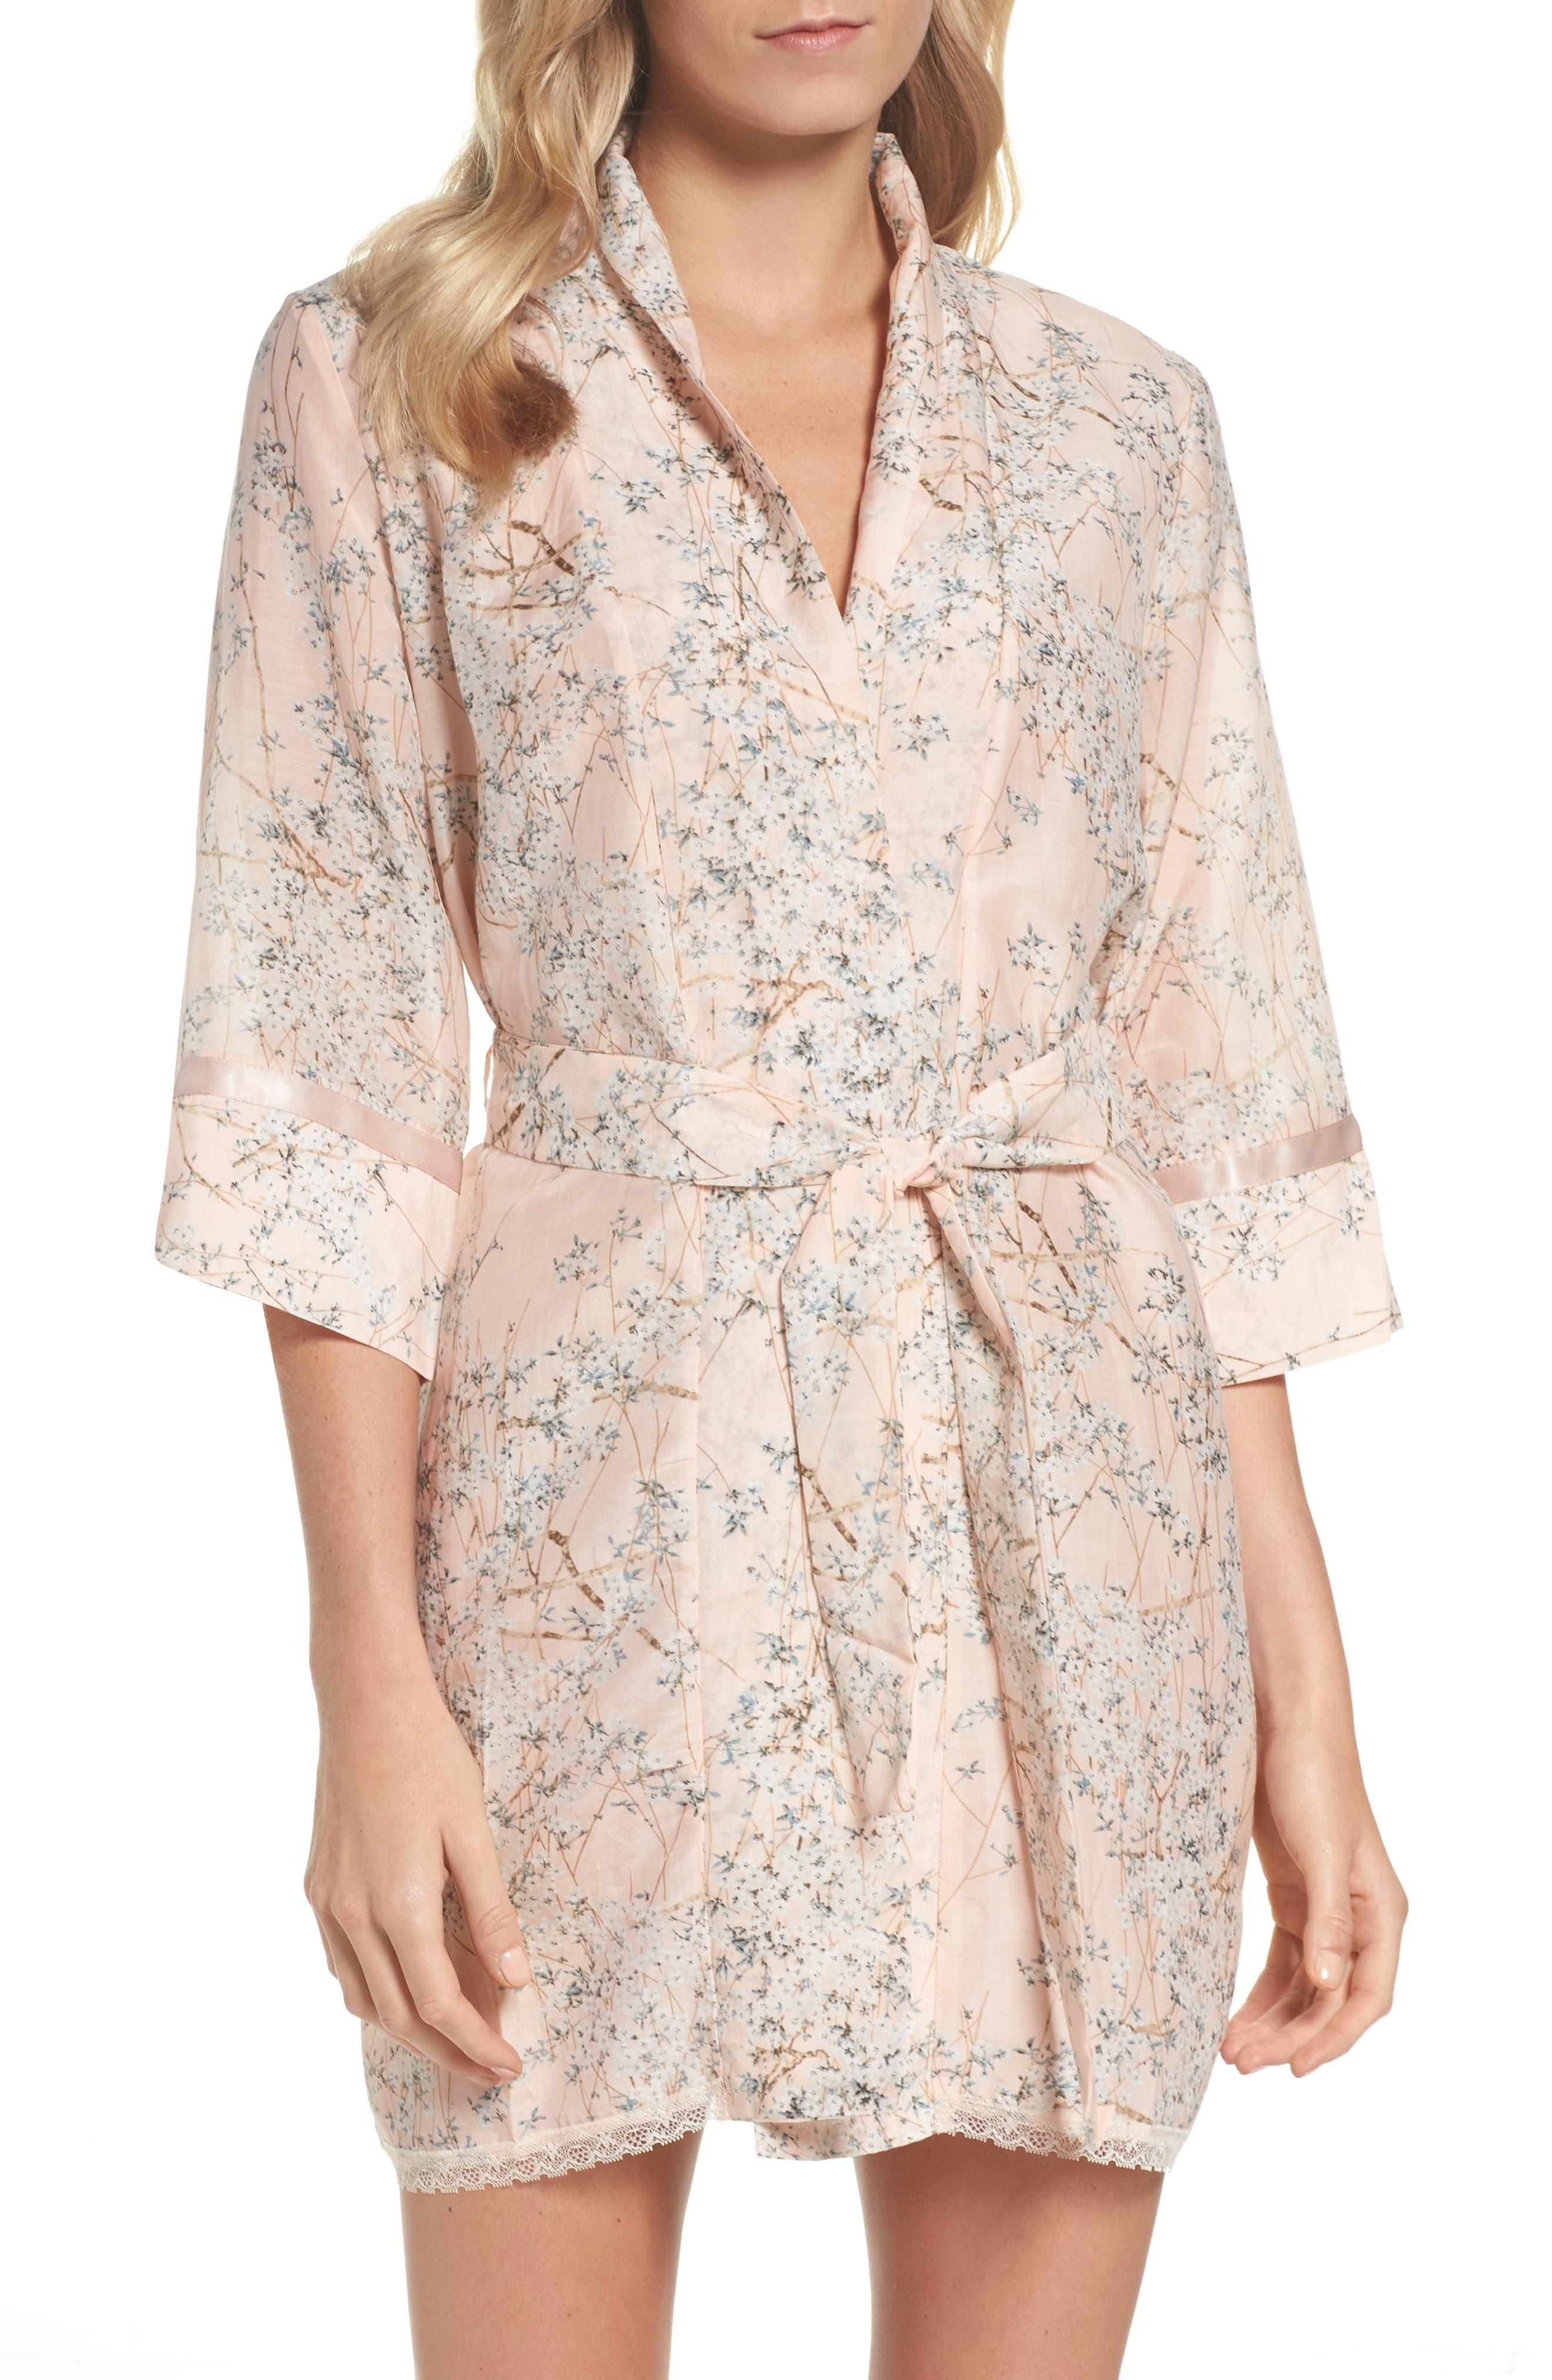 PAPINELLE,                             Cherry Blossom Cotton & Silk Short Robe,                             Main thumbnail 1, color,                             950